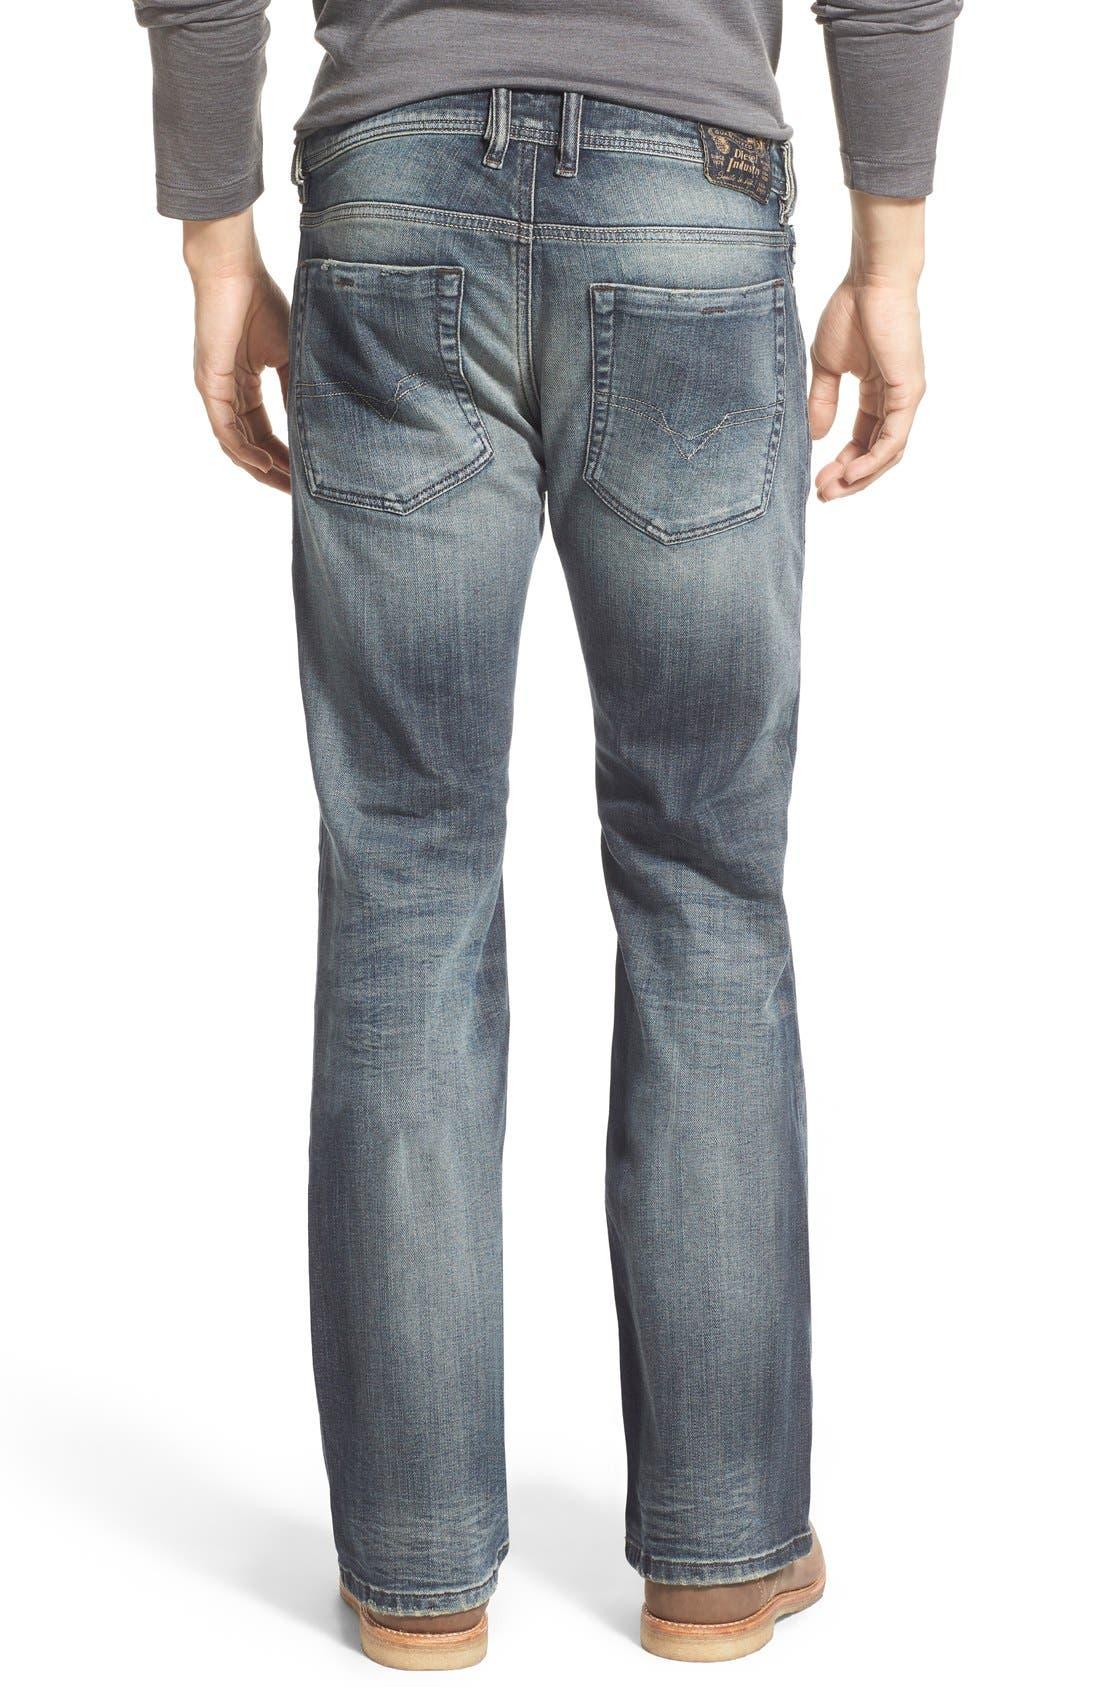 'Zathan' Bootcut Jeans,                             Alternate thumbnail 2, color,                             885K